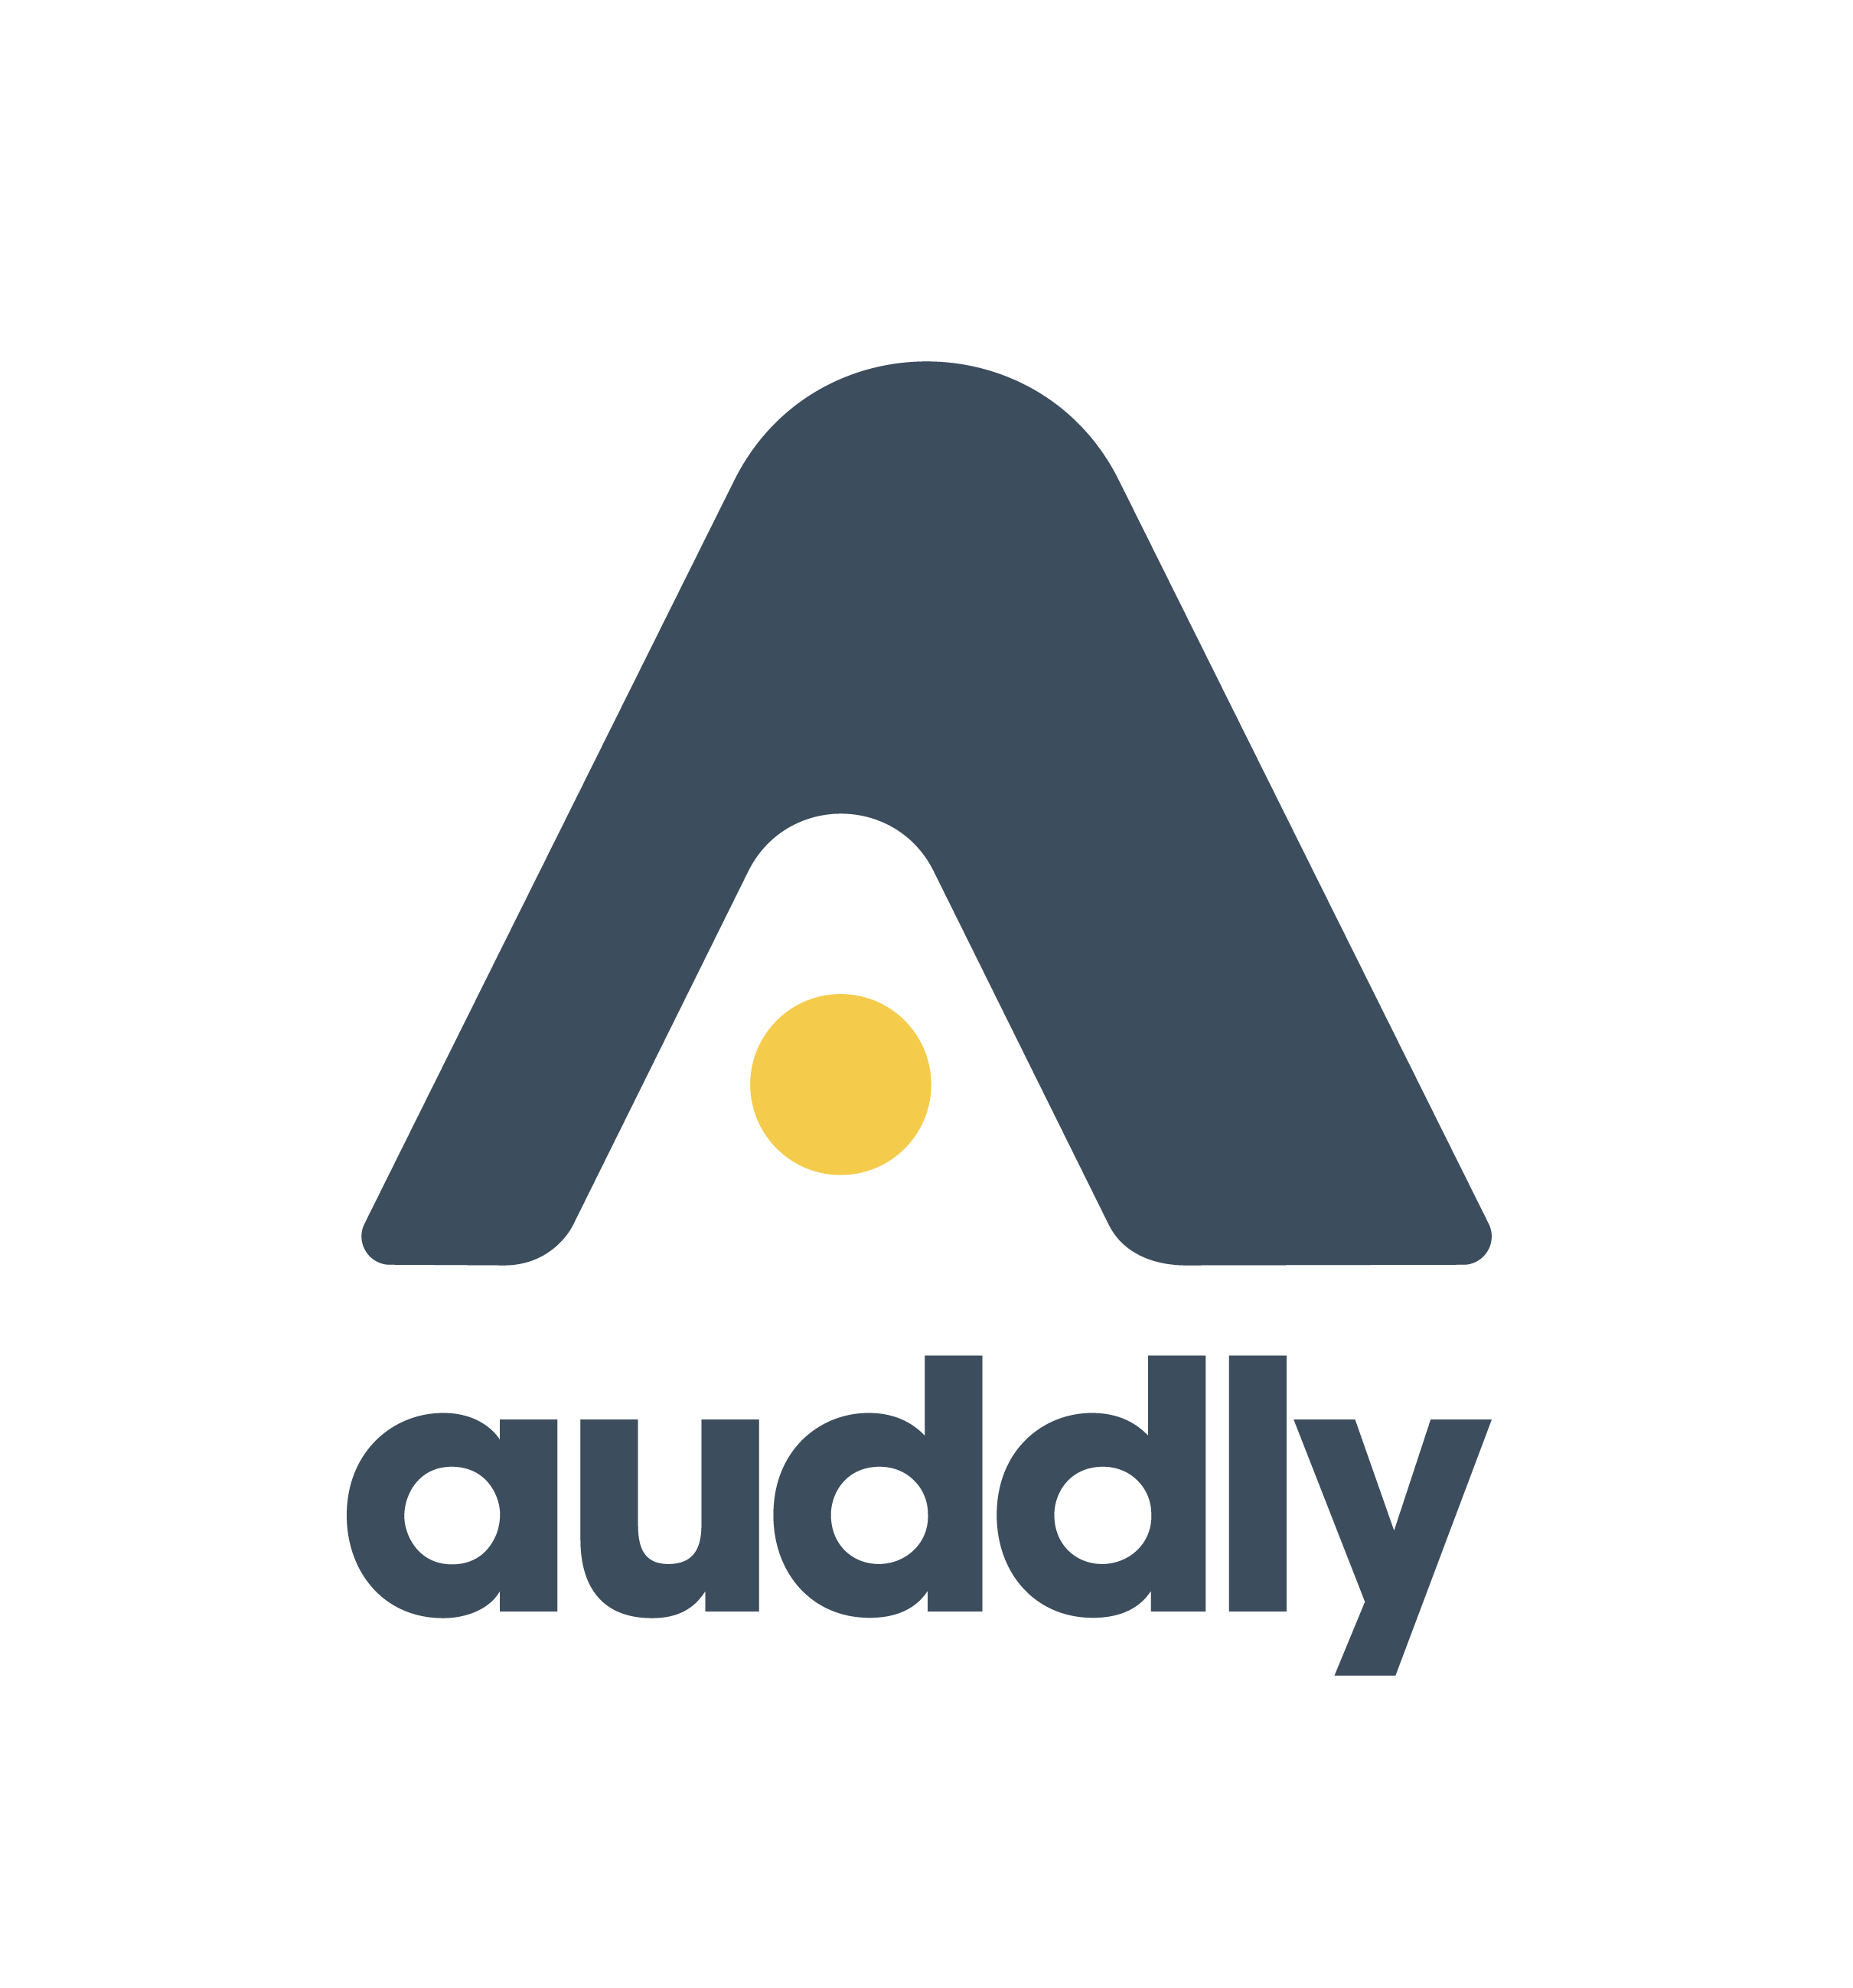 Auddly AB